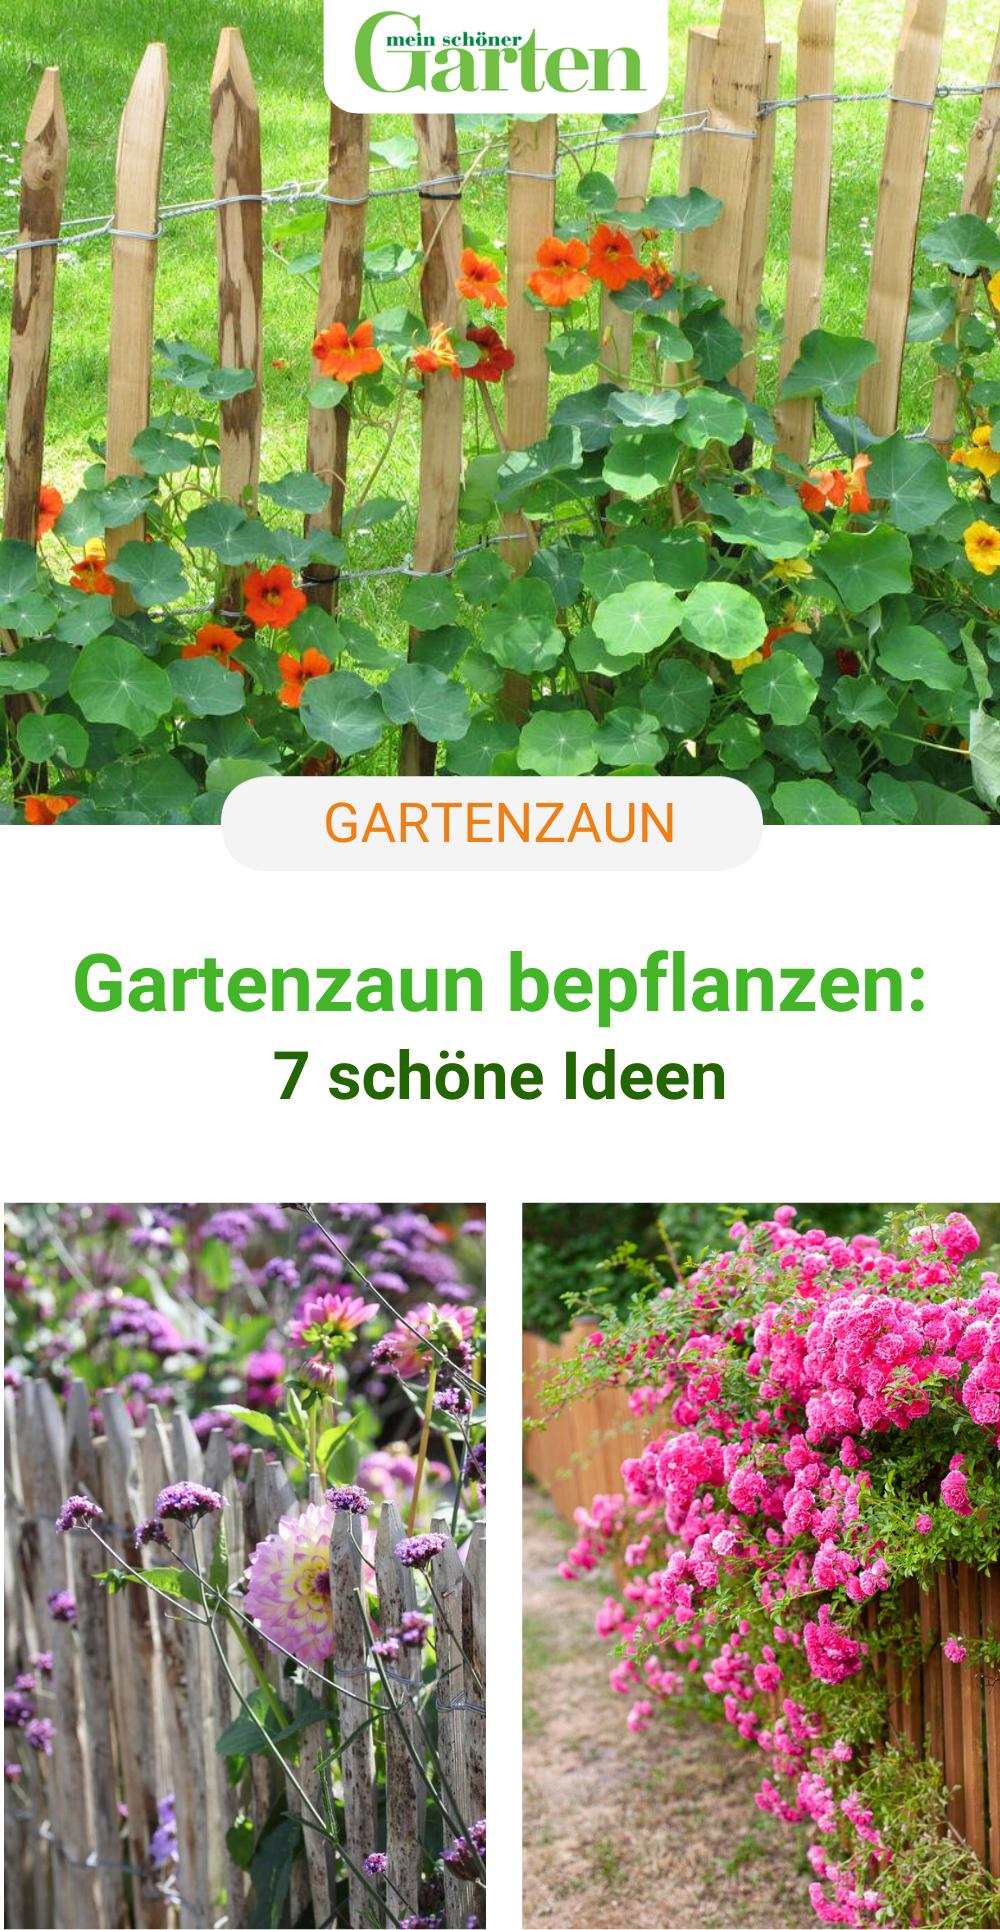 Gartenzaun bepflanzen: 7 schöne Ideen